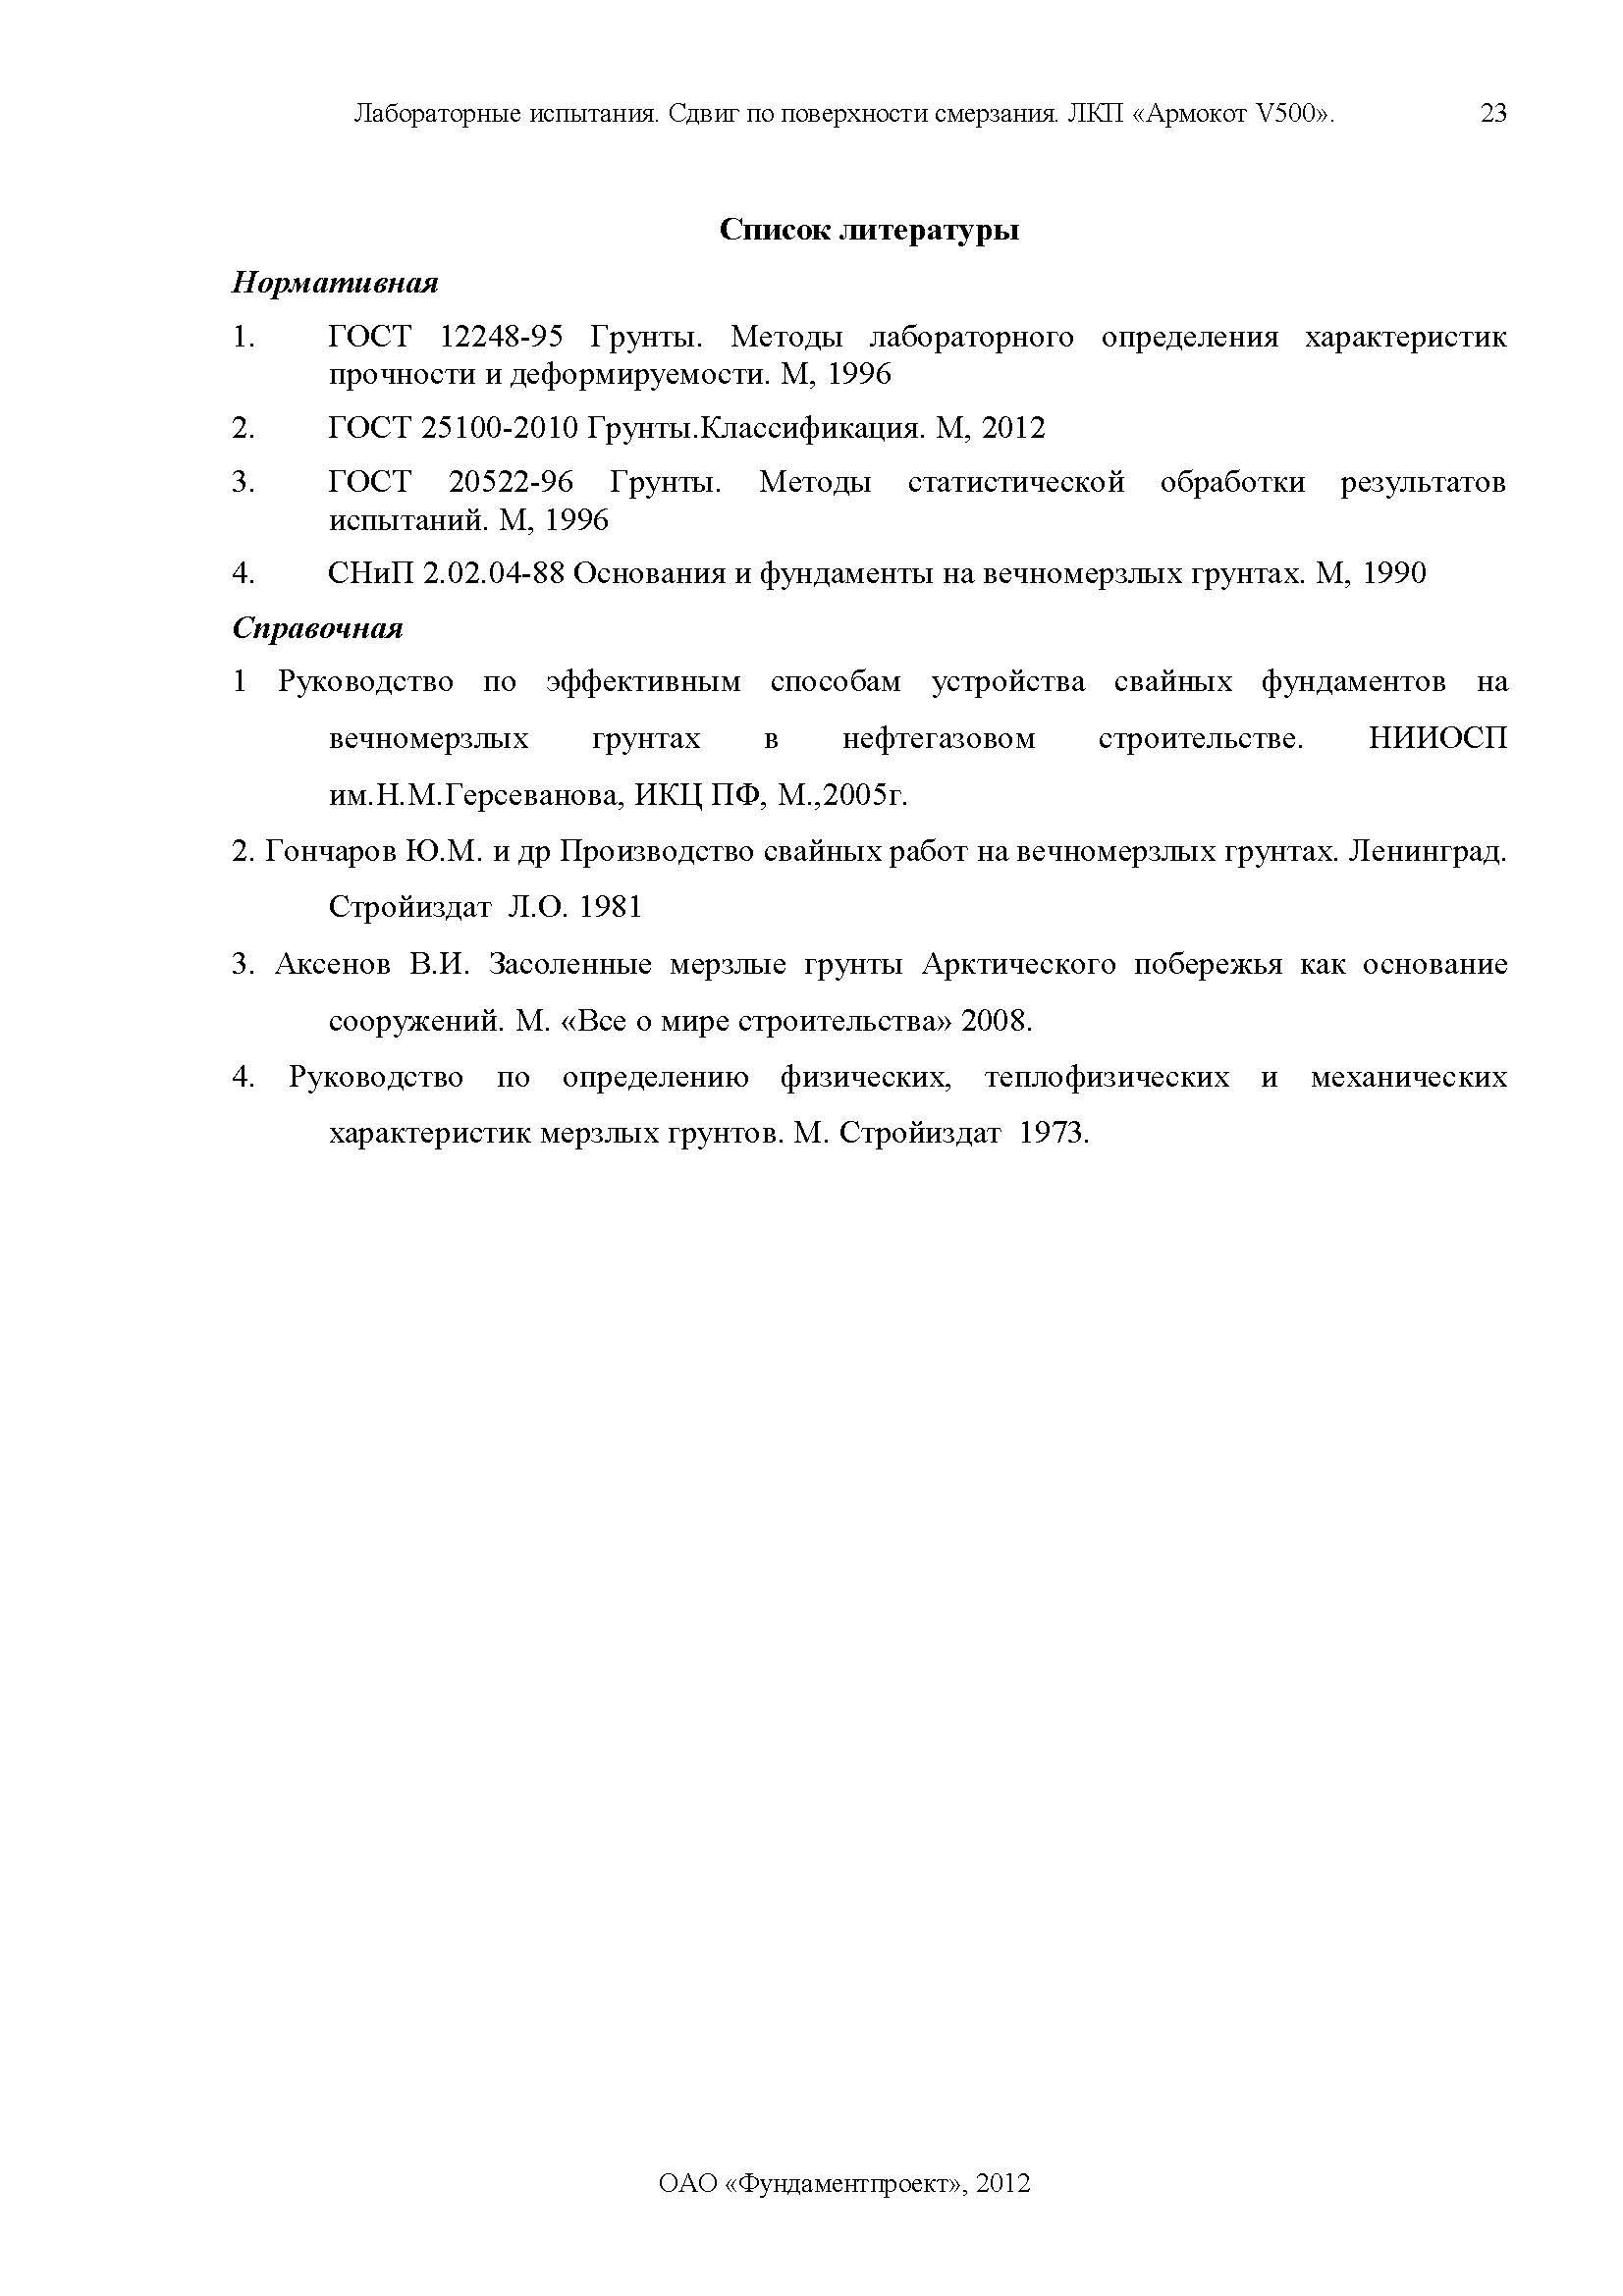 Отчет по сваям Армокот V500 Фундаментпроект_Страница_23